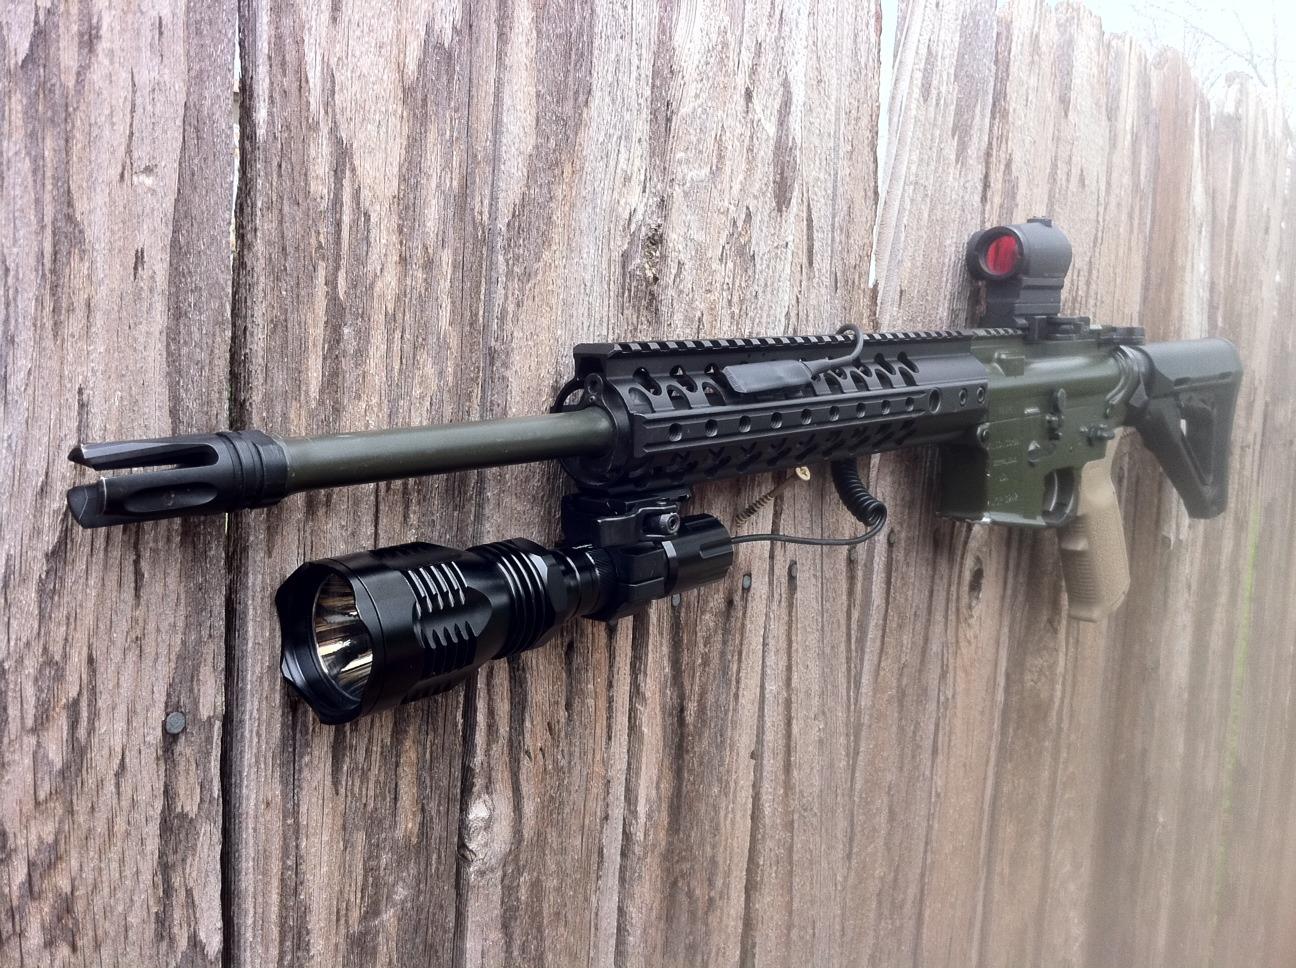 selph arms vrl 1 green led hunting light review gun reviews. Black Bedroom Furniture Sets. Home Design Ideas